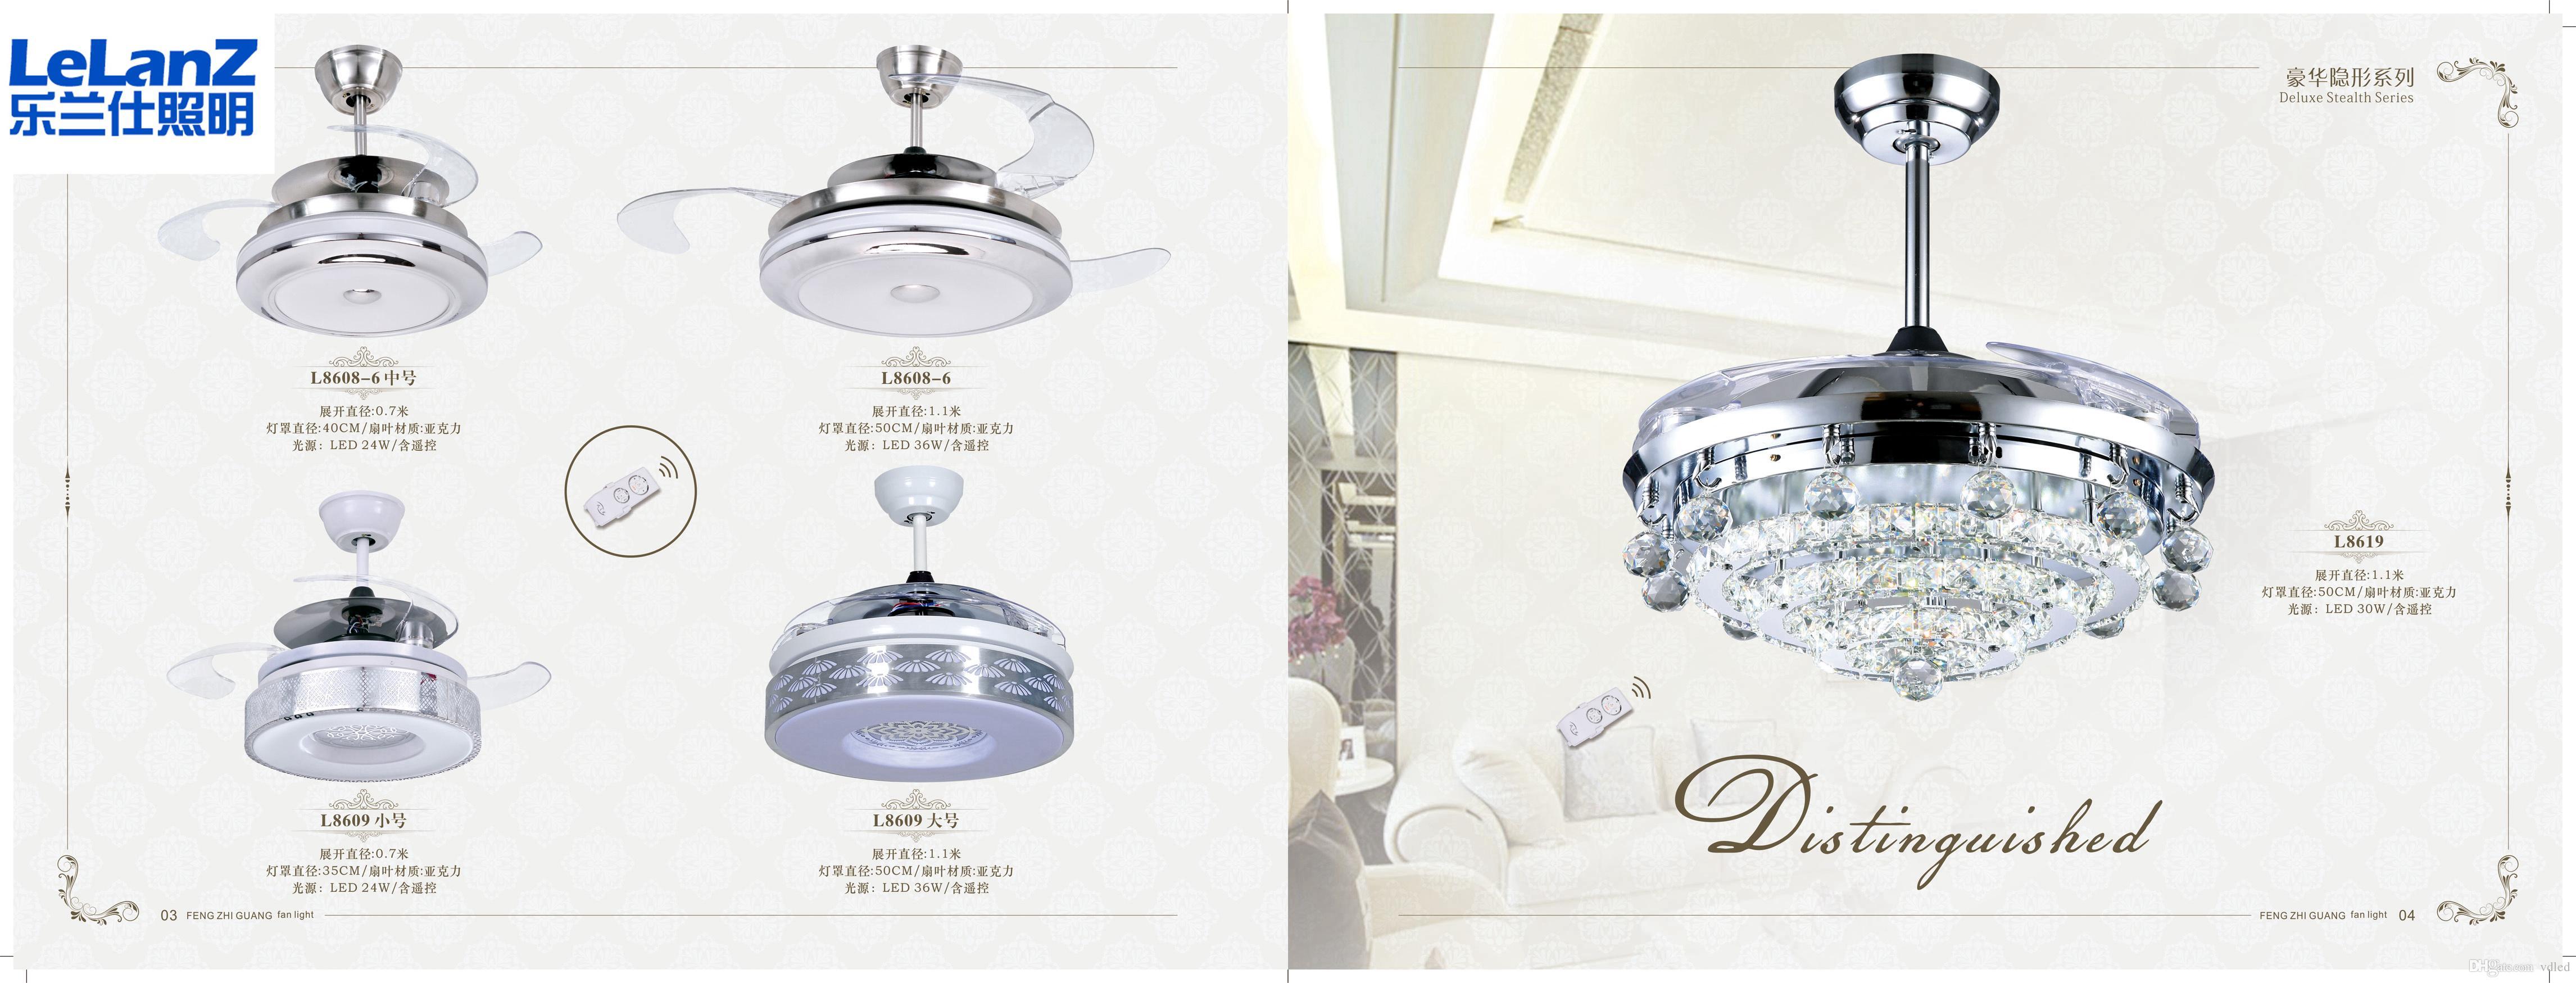 Wholesale ade of ceiling fan lamp Mediterranean European style of